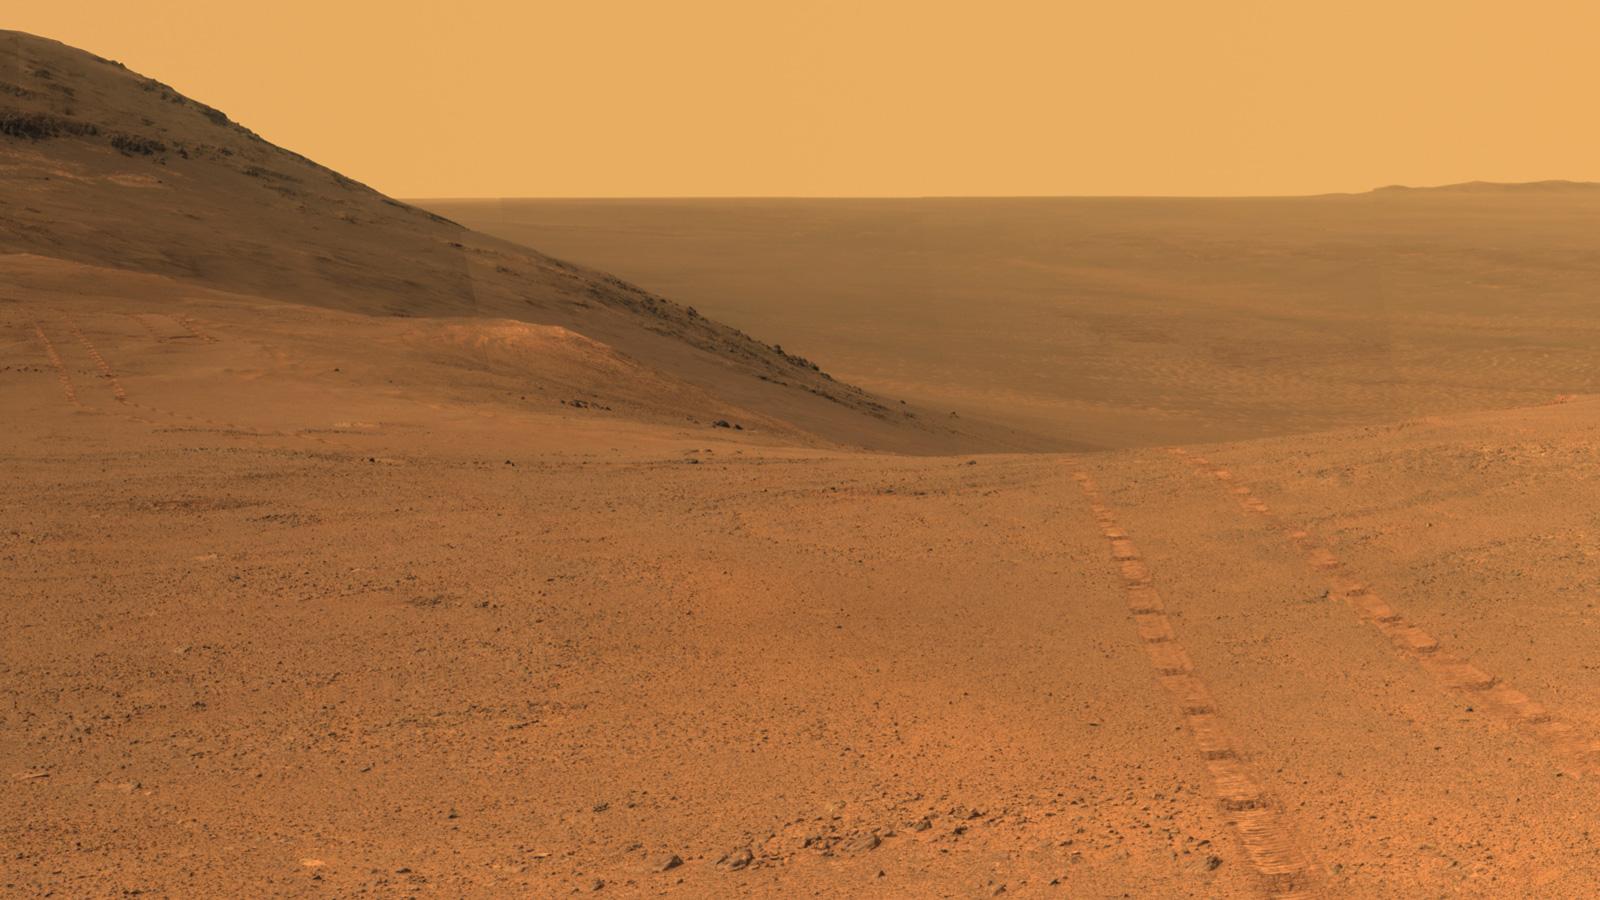 FOTO/Opportunity Rover, Mars, NASA